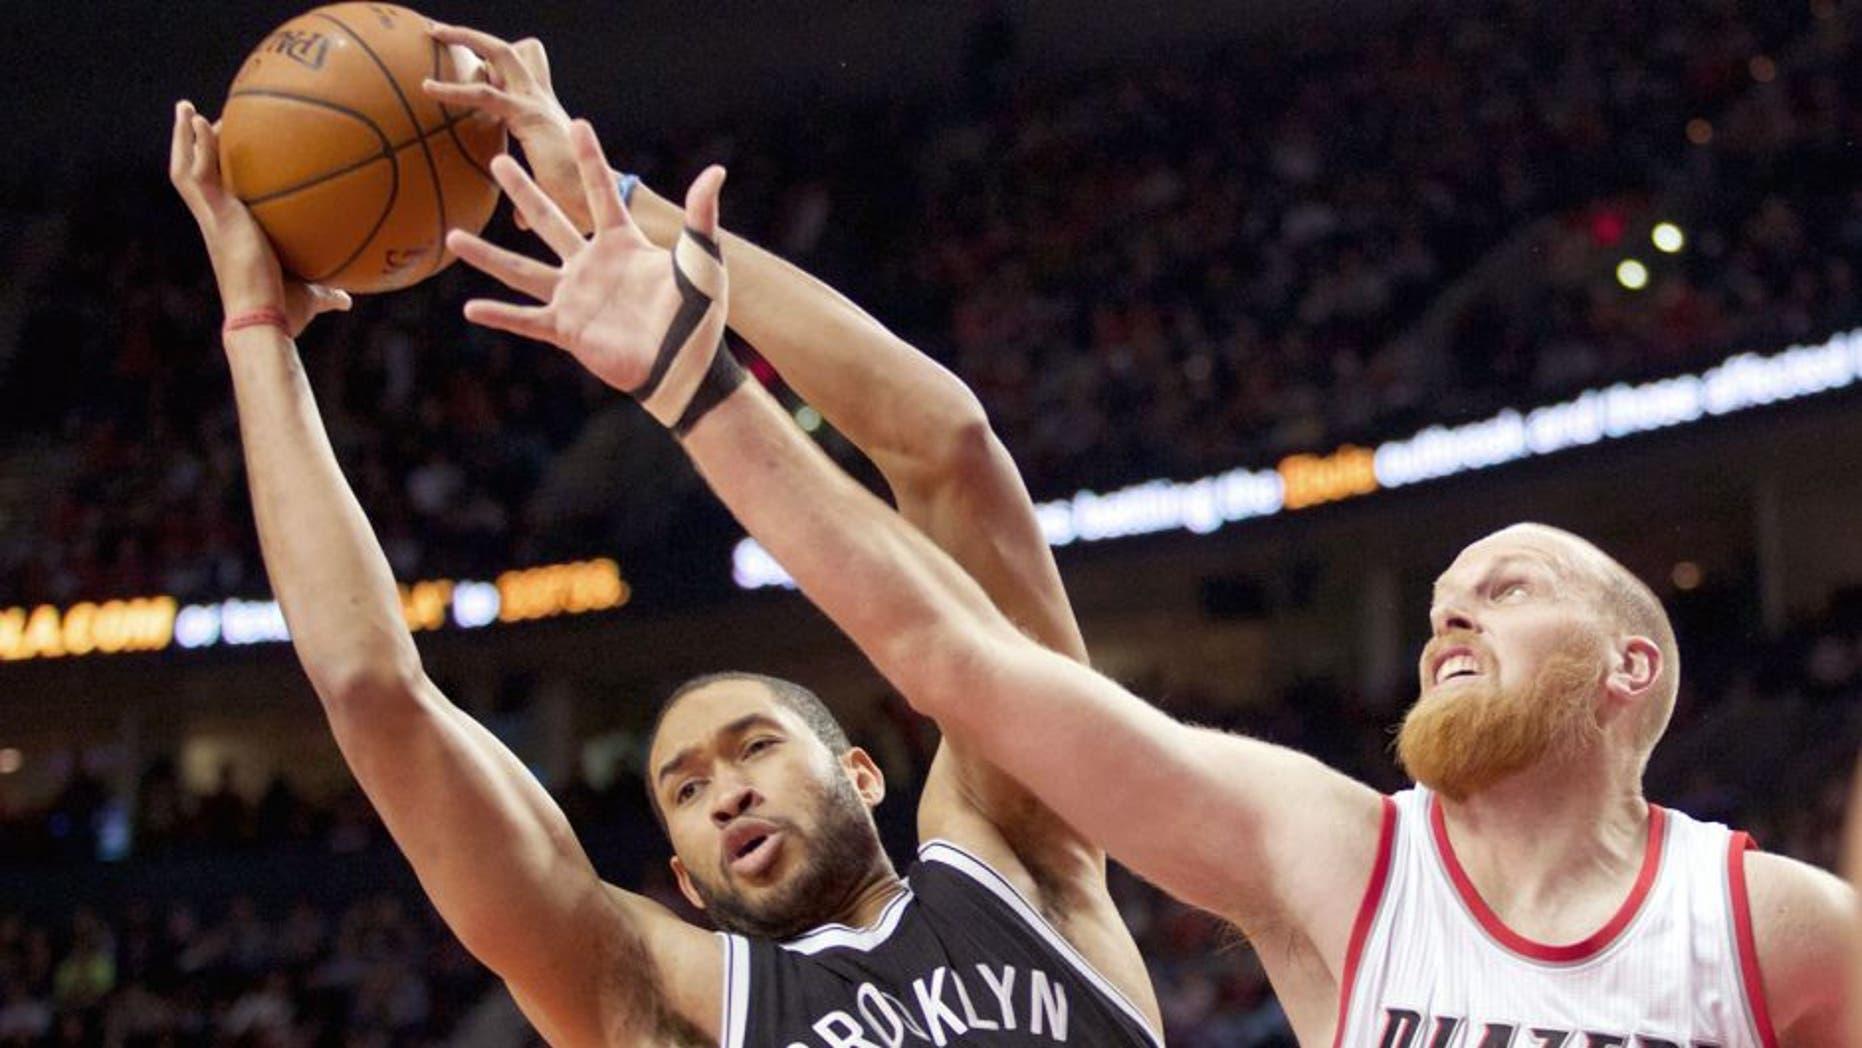 Nov 15, 2014; Portland, OR, USA; Brooklyn Nets center Jerome Jordan (9) and Portland Trail Blazers center Chris Kaman (35) go up for a rebound at Moda Center at the Rose Quarter. Mandatory Credit: Jaime Valdez-USA TODAY Sports